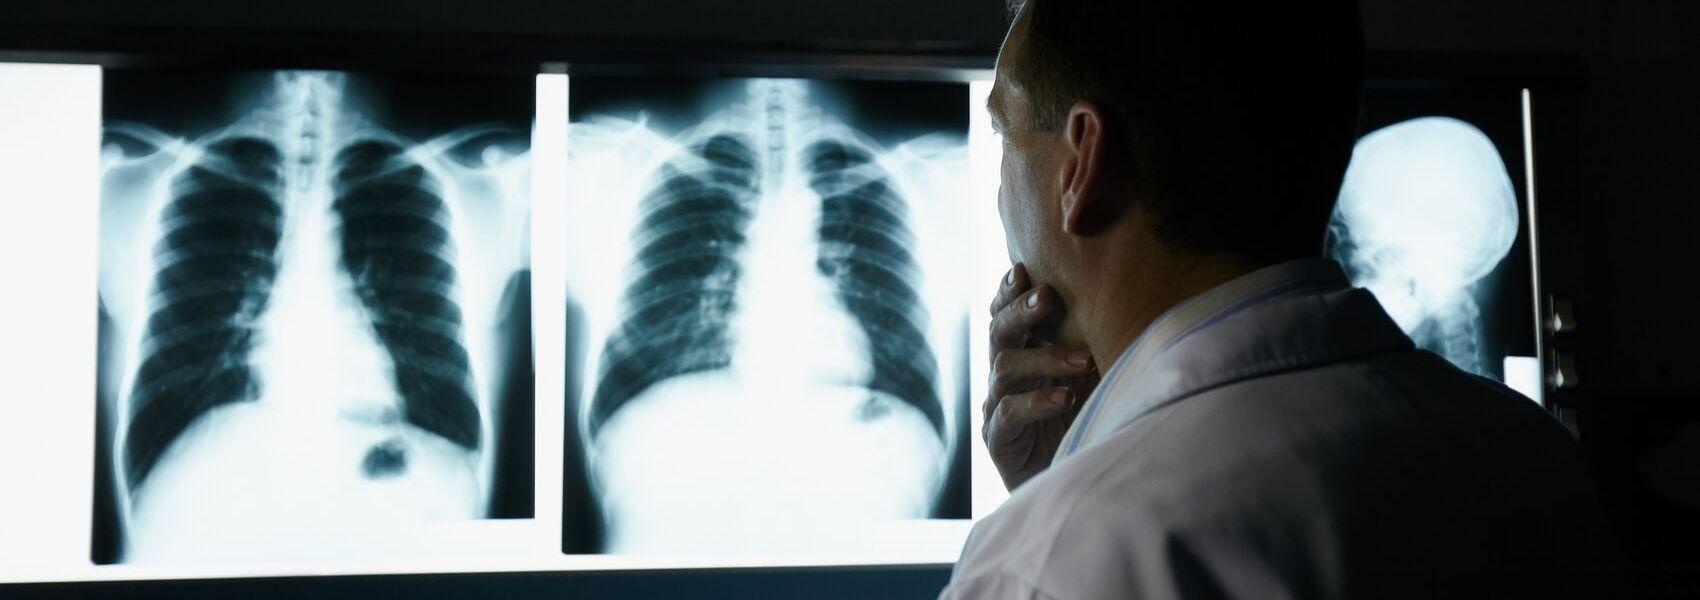 encontro sobre radiologia